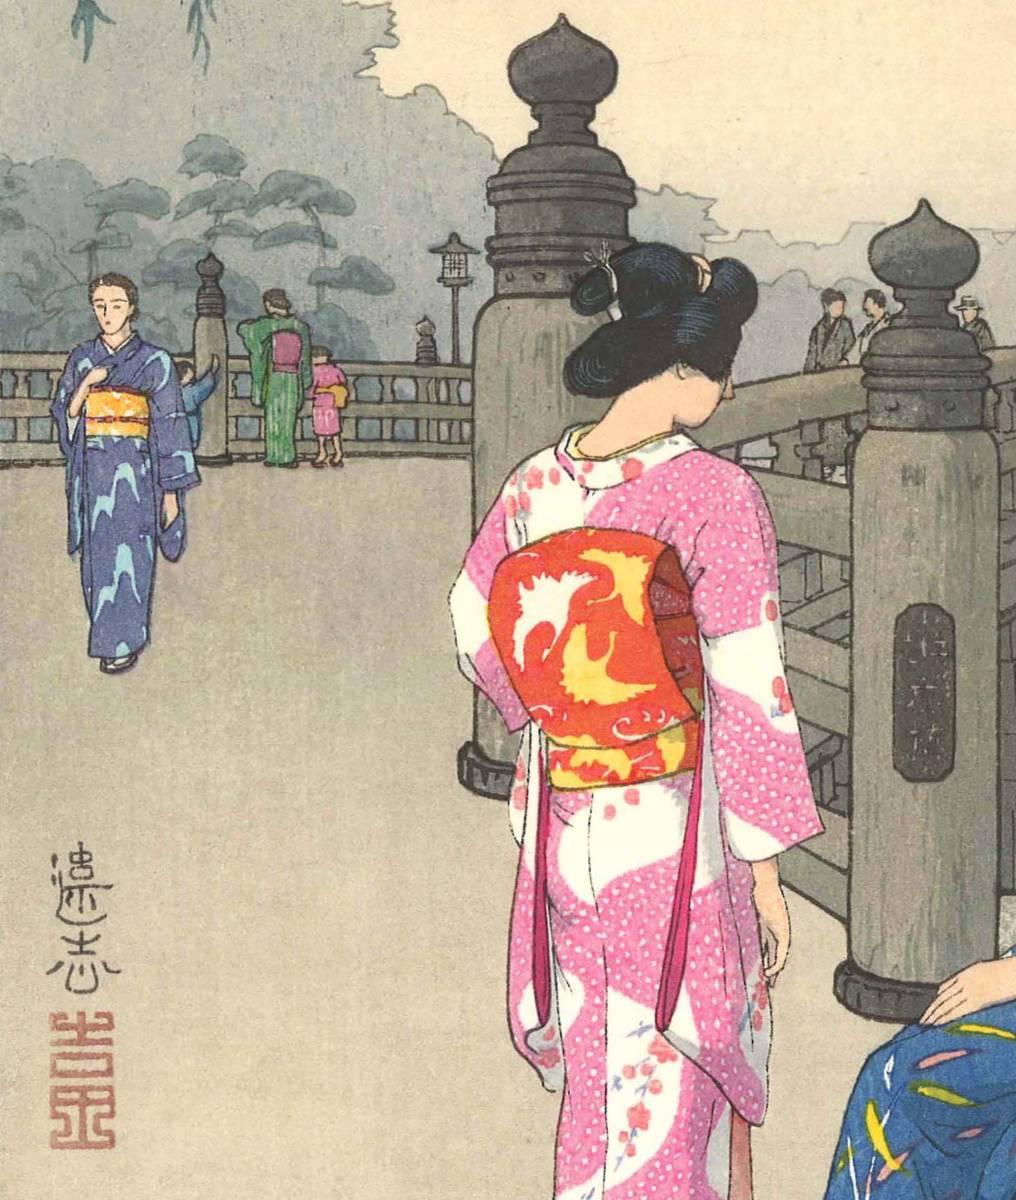 吉田遠志 木版画  014103 弁慶橋 (Benkei Bridge)  初摺1941年    最高峰の摺師の技をご堪能下さい!!_画像9